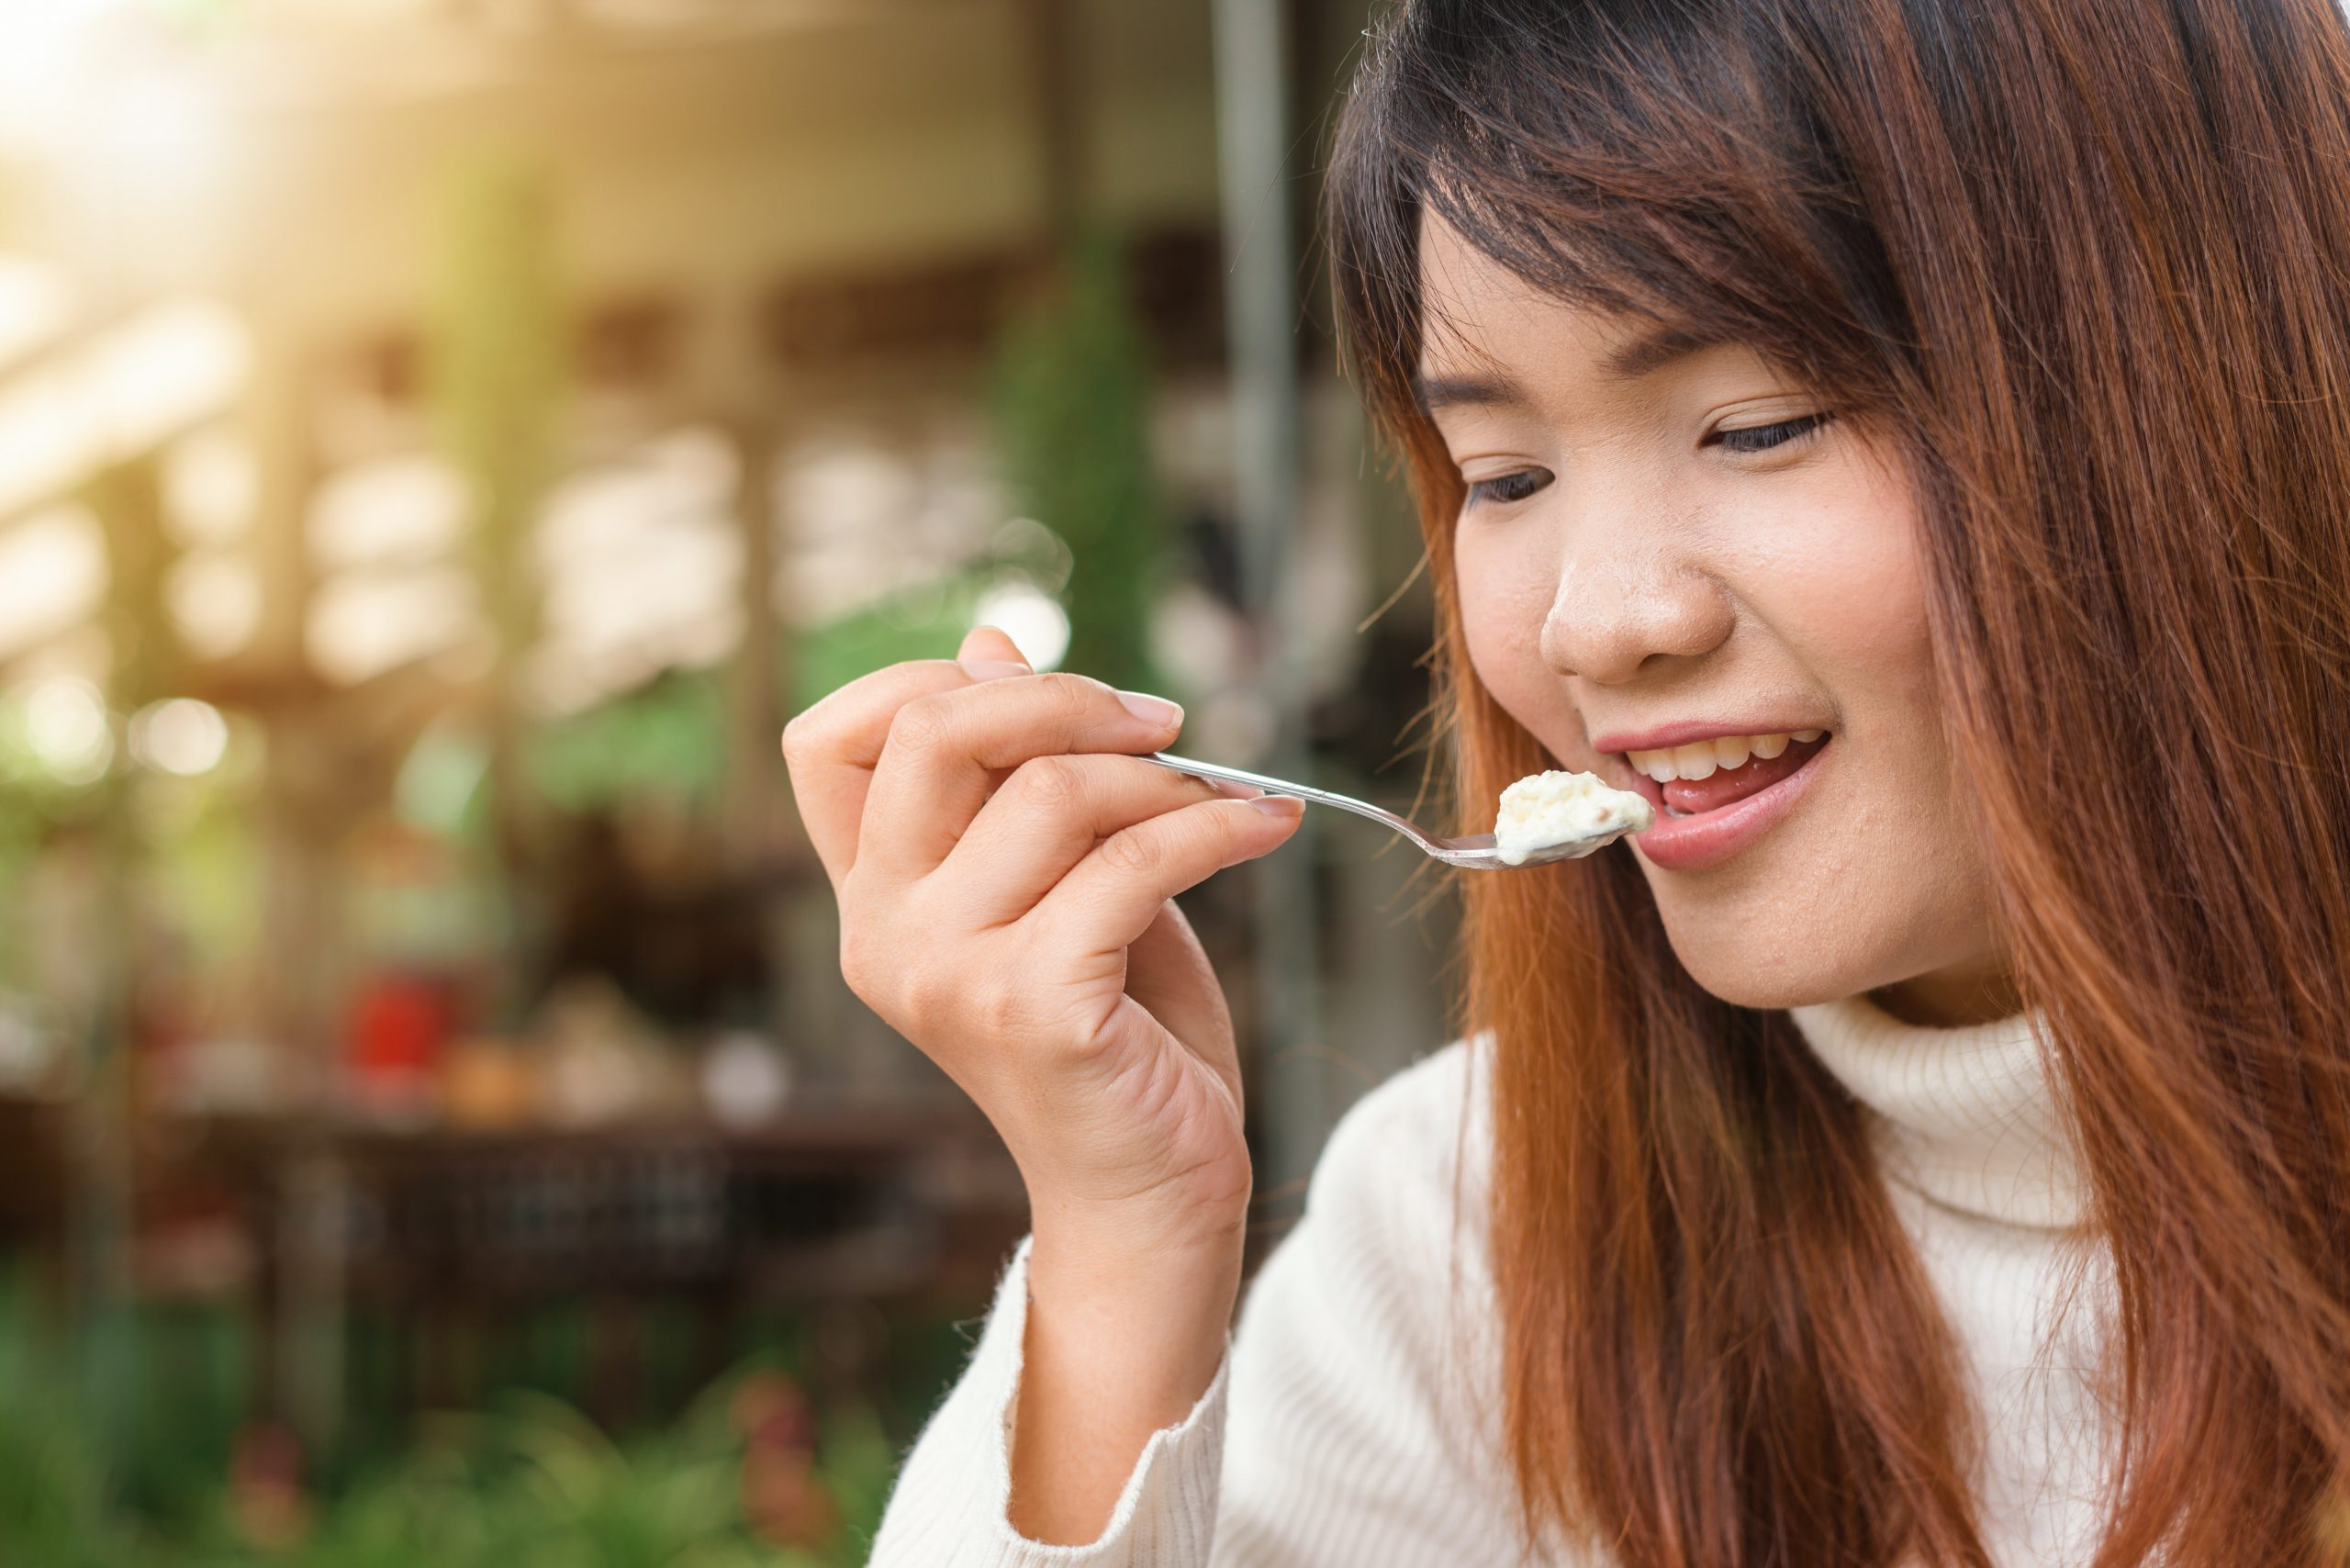 chica comiendo yogurt